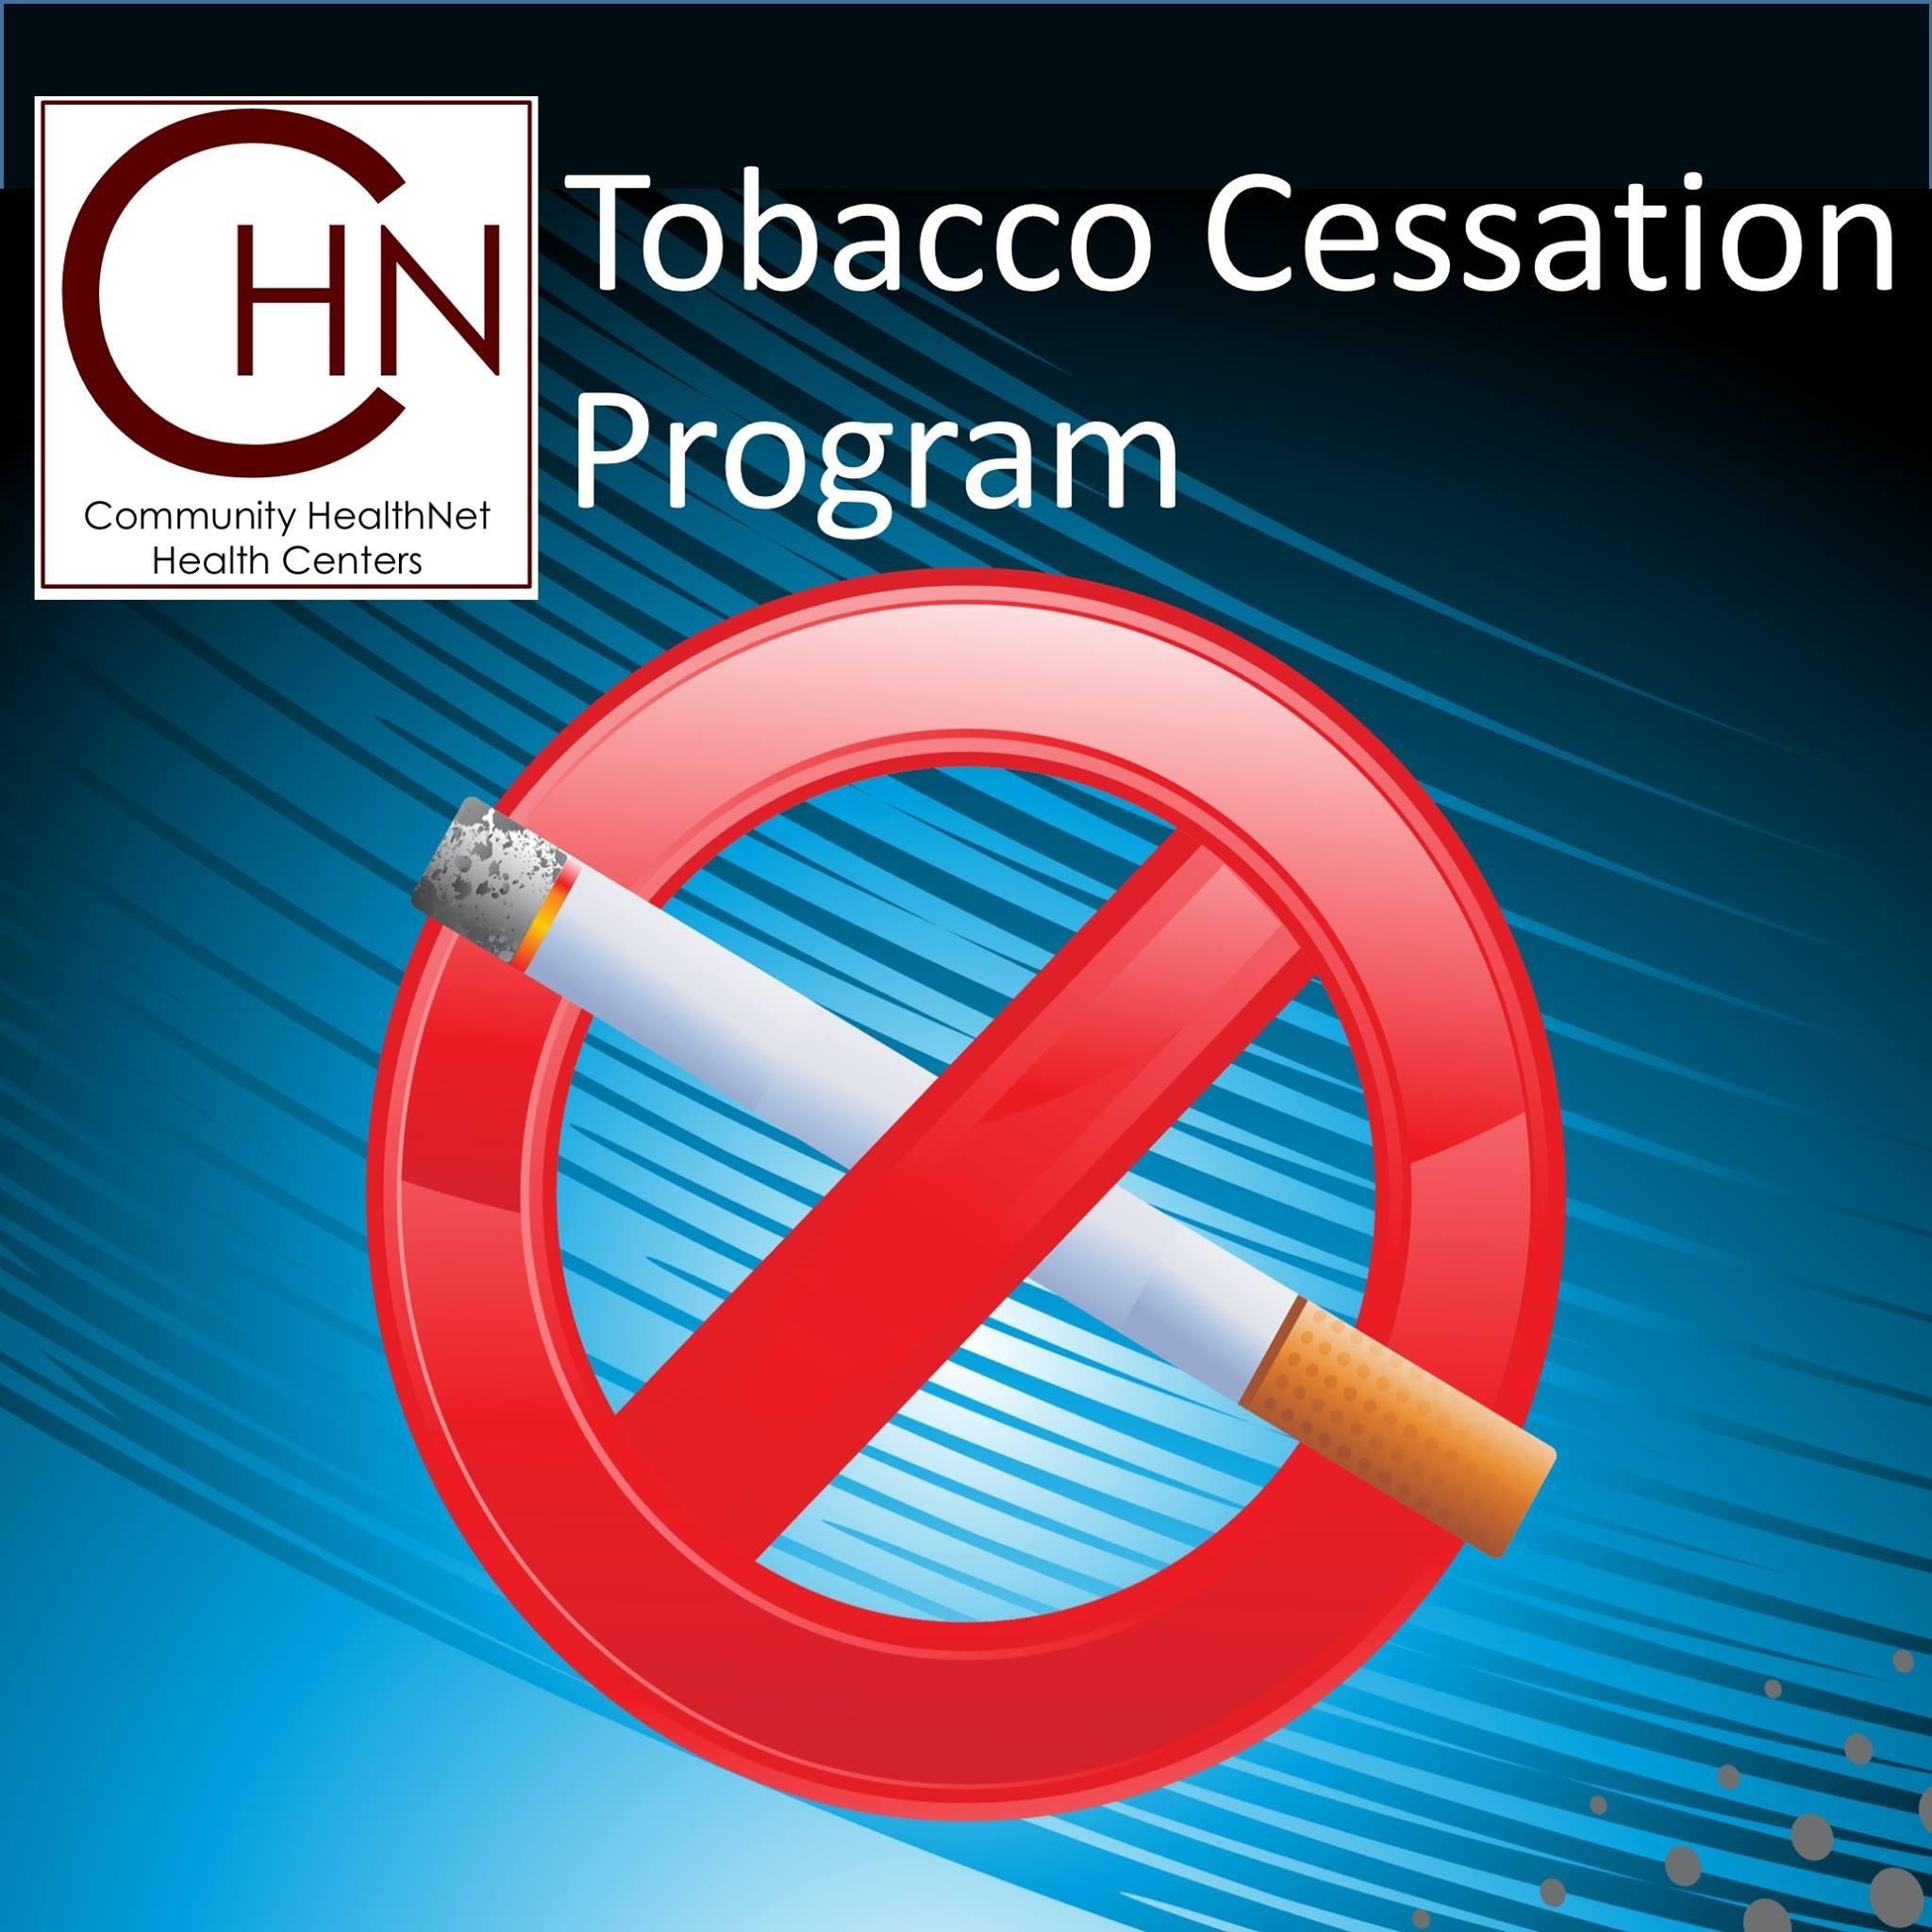 CHN's Tobacco Cessation Program